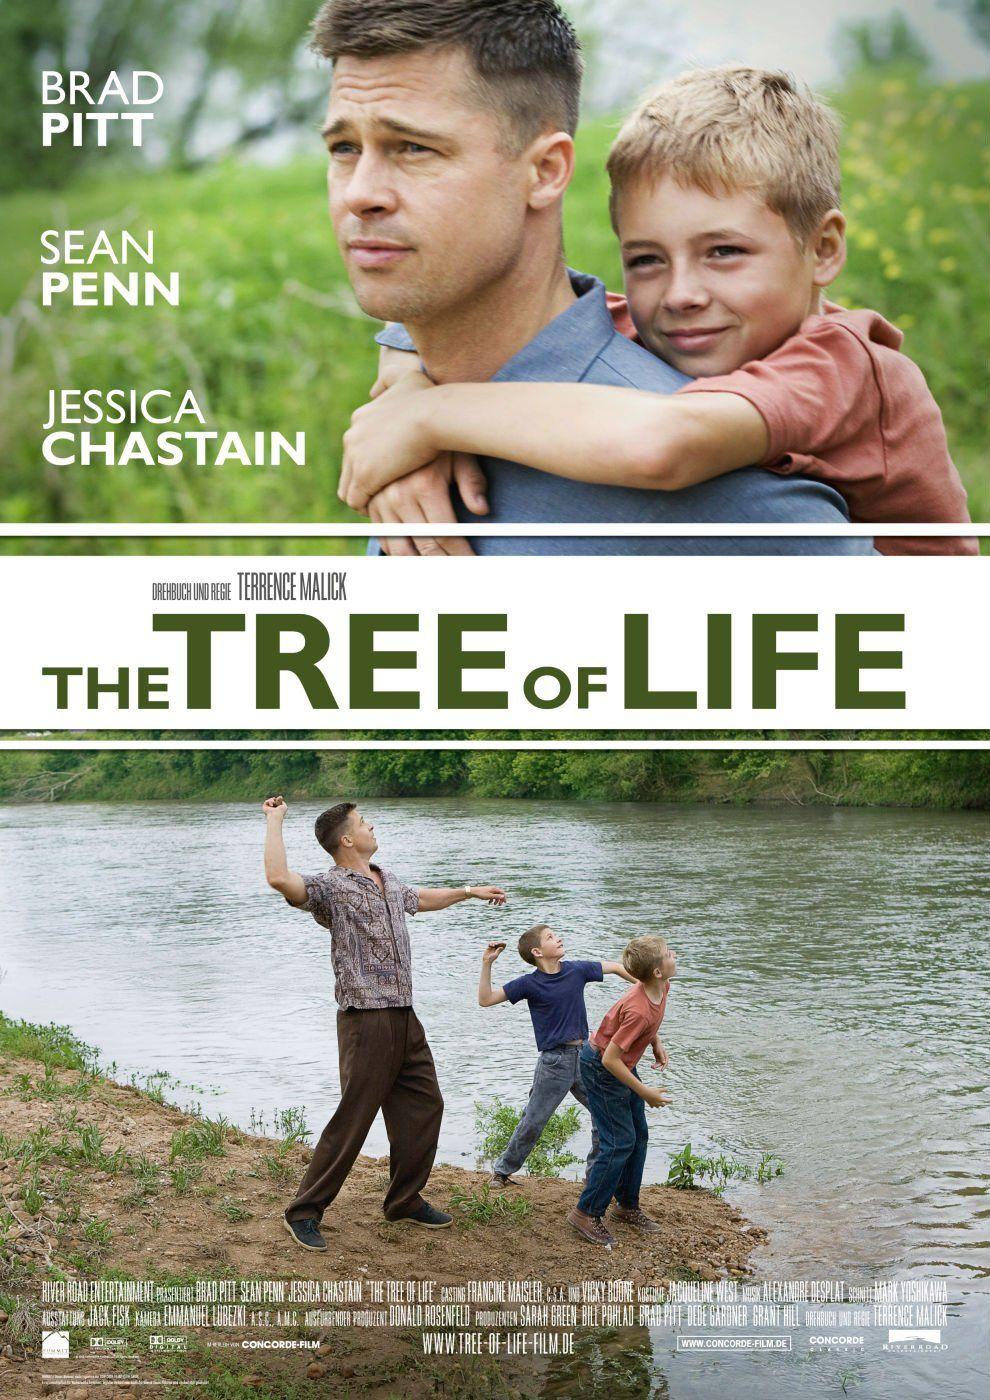 BRAD PITT TREE OF LIFE PETIT-DIEULOIS